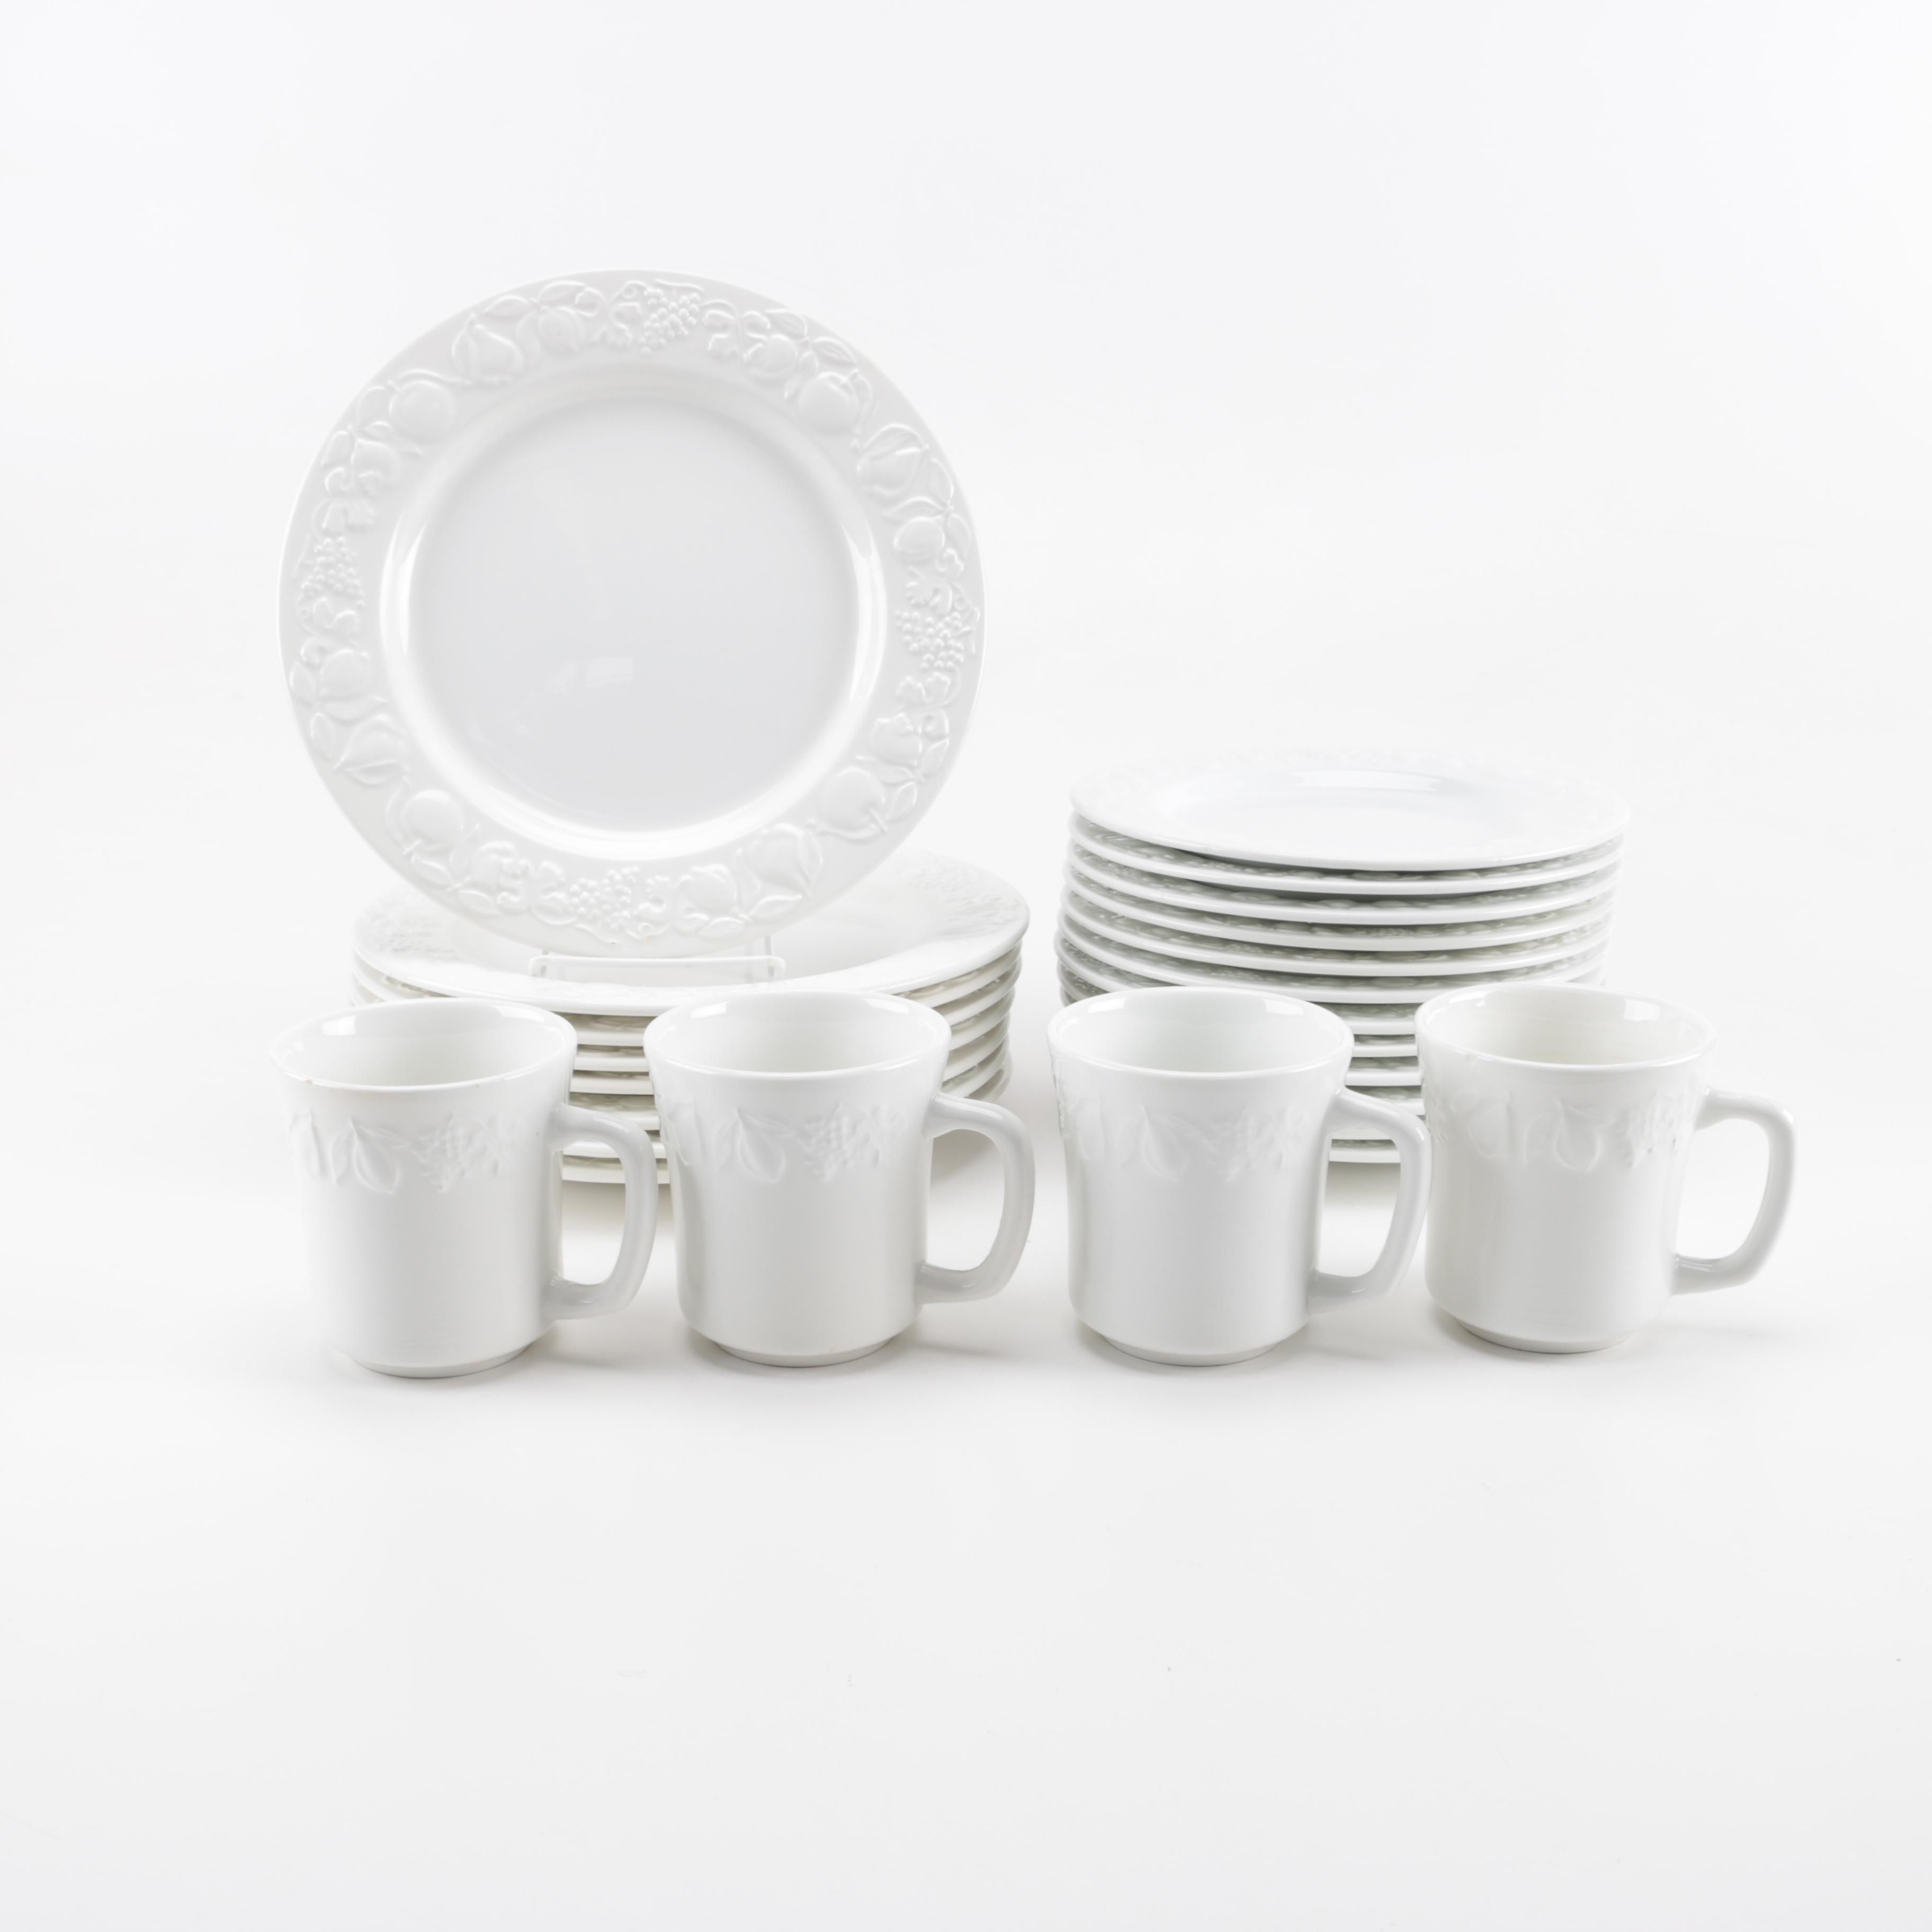 Franco Giorgi by Quadrifoglio Italian Tableware